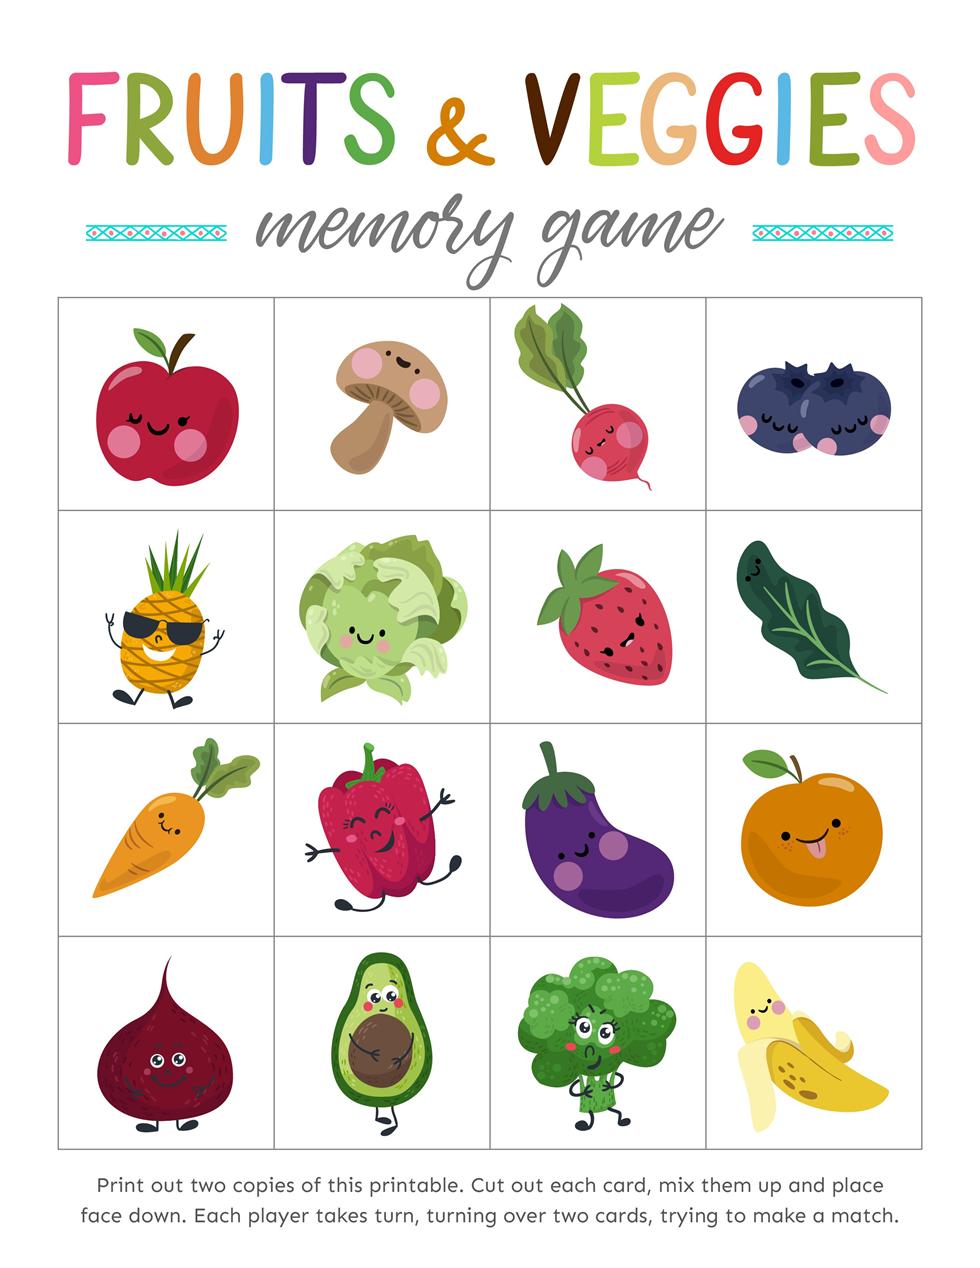 Free Printable Fruits And Veggies Memory Games Memory Games Healthy Food Activities For Preschool Printables Free Kids [ 1268 x 980 Pixel ]